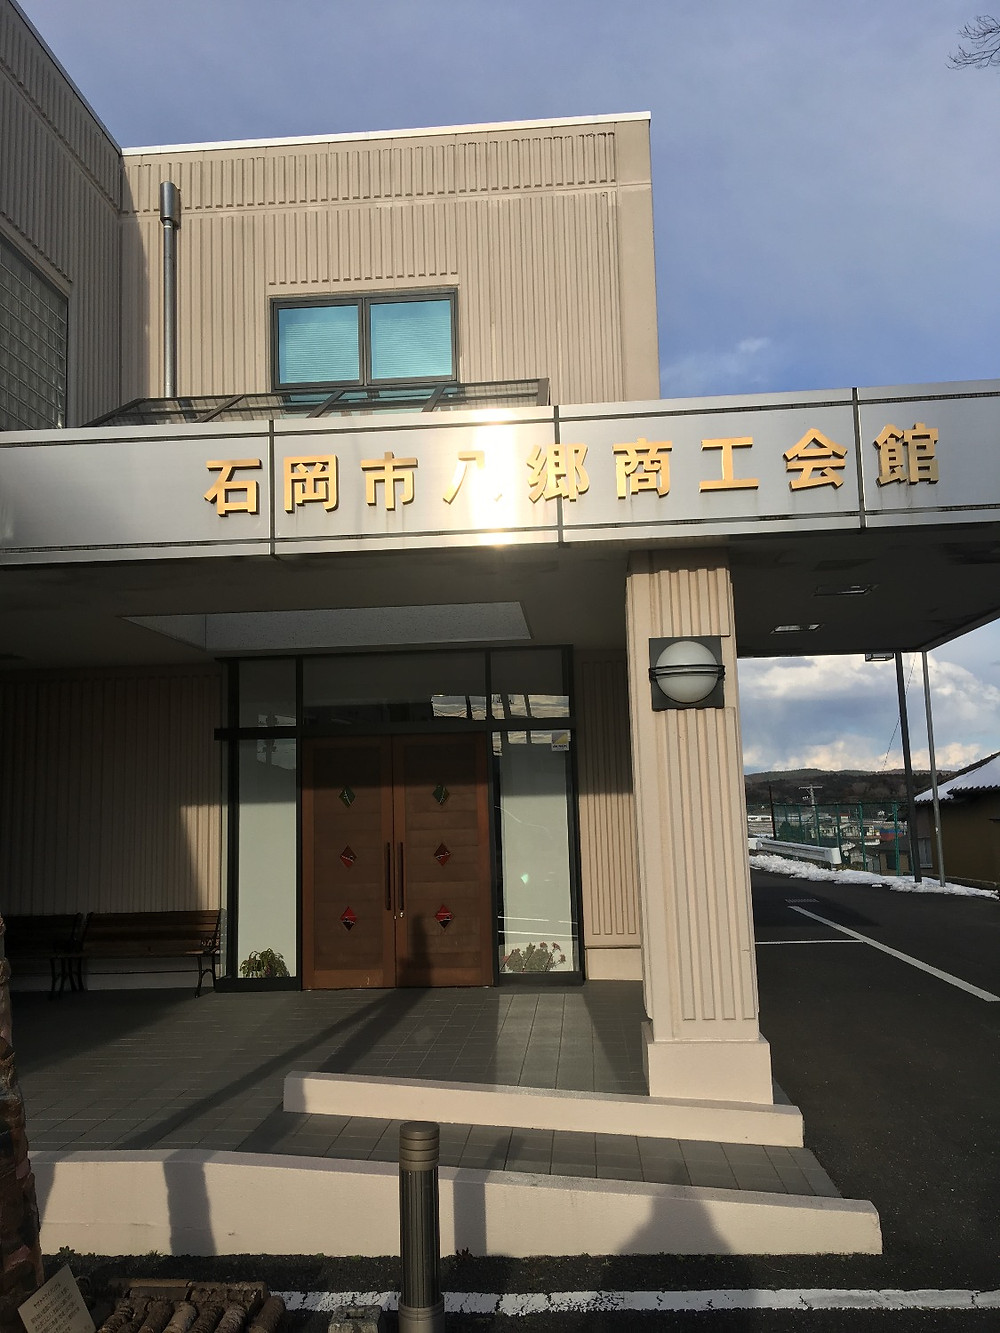 石岡市八郷商工会館の建物